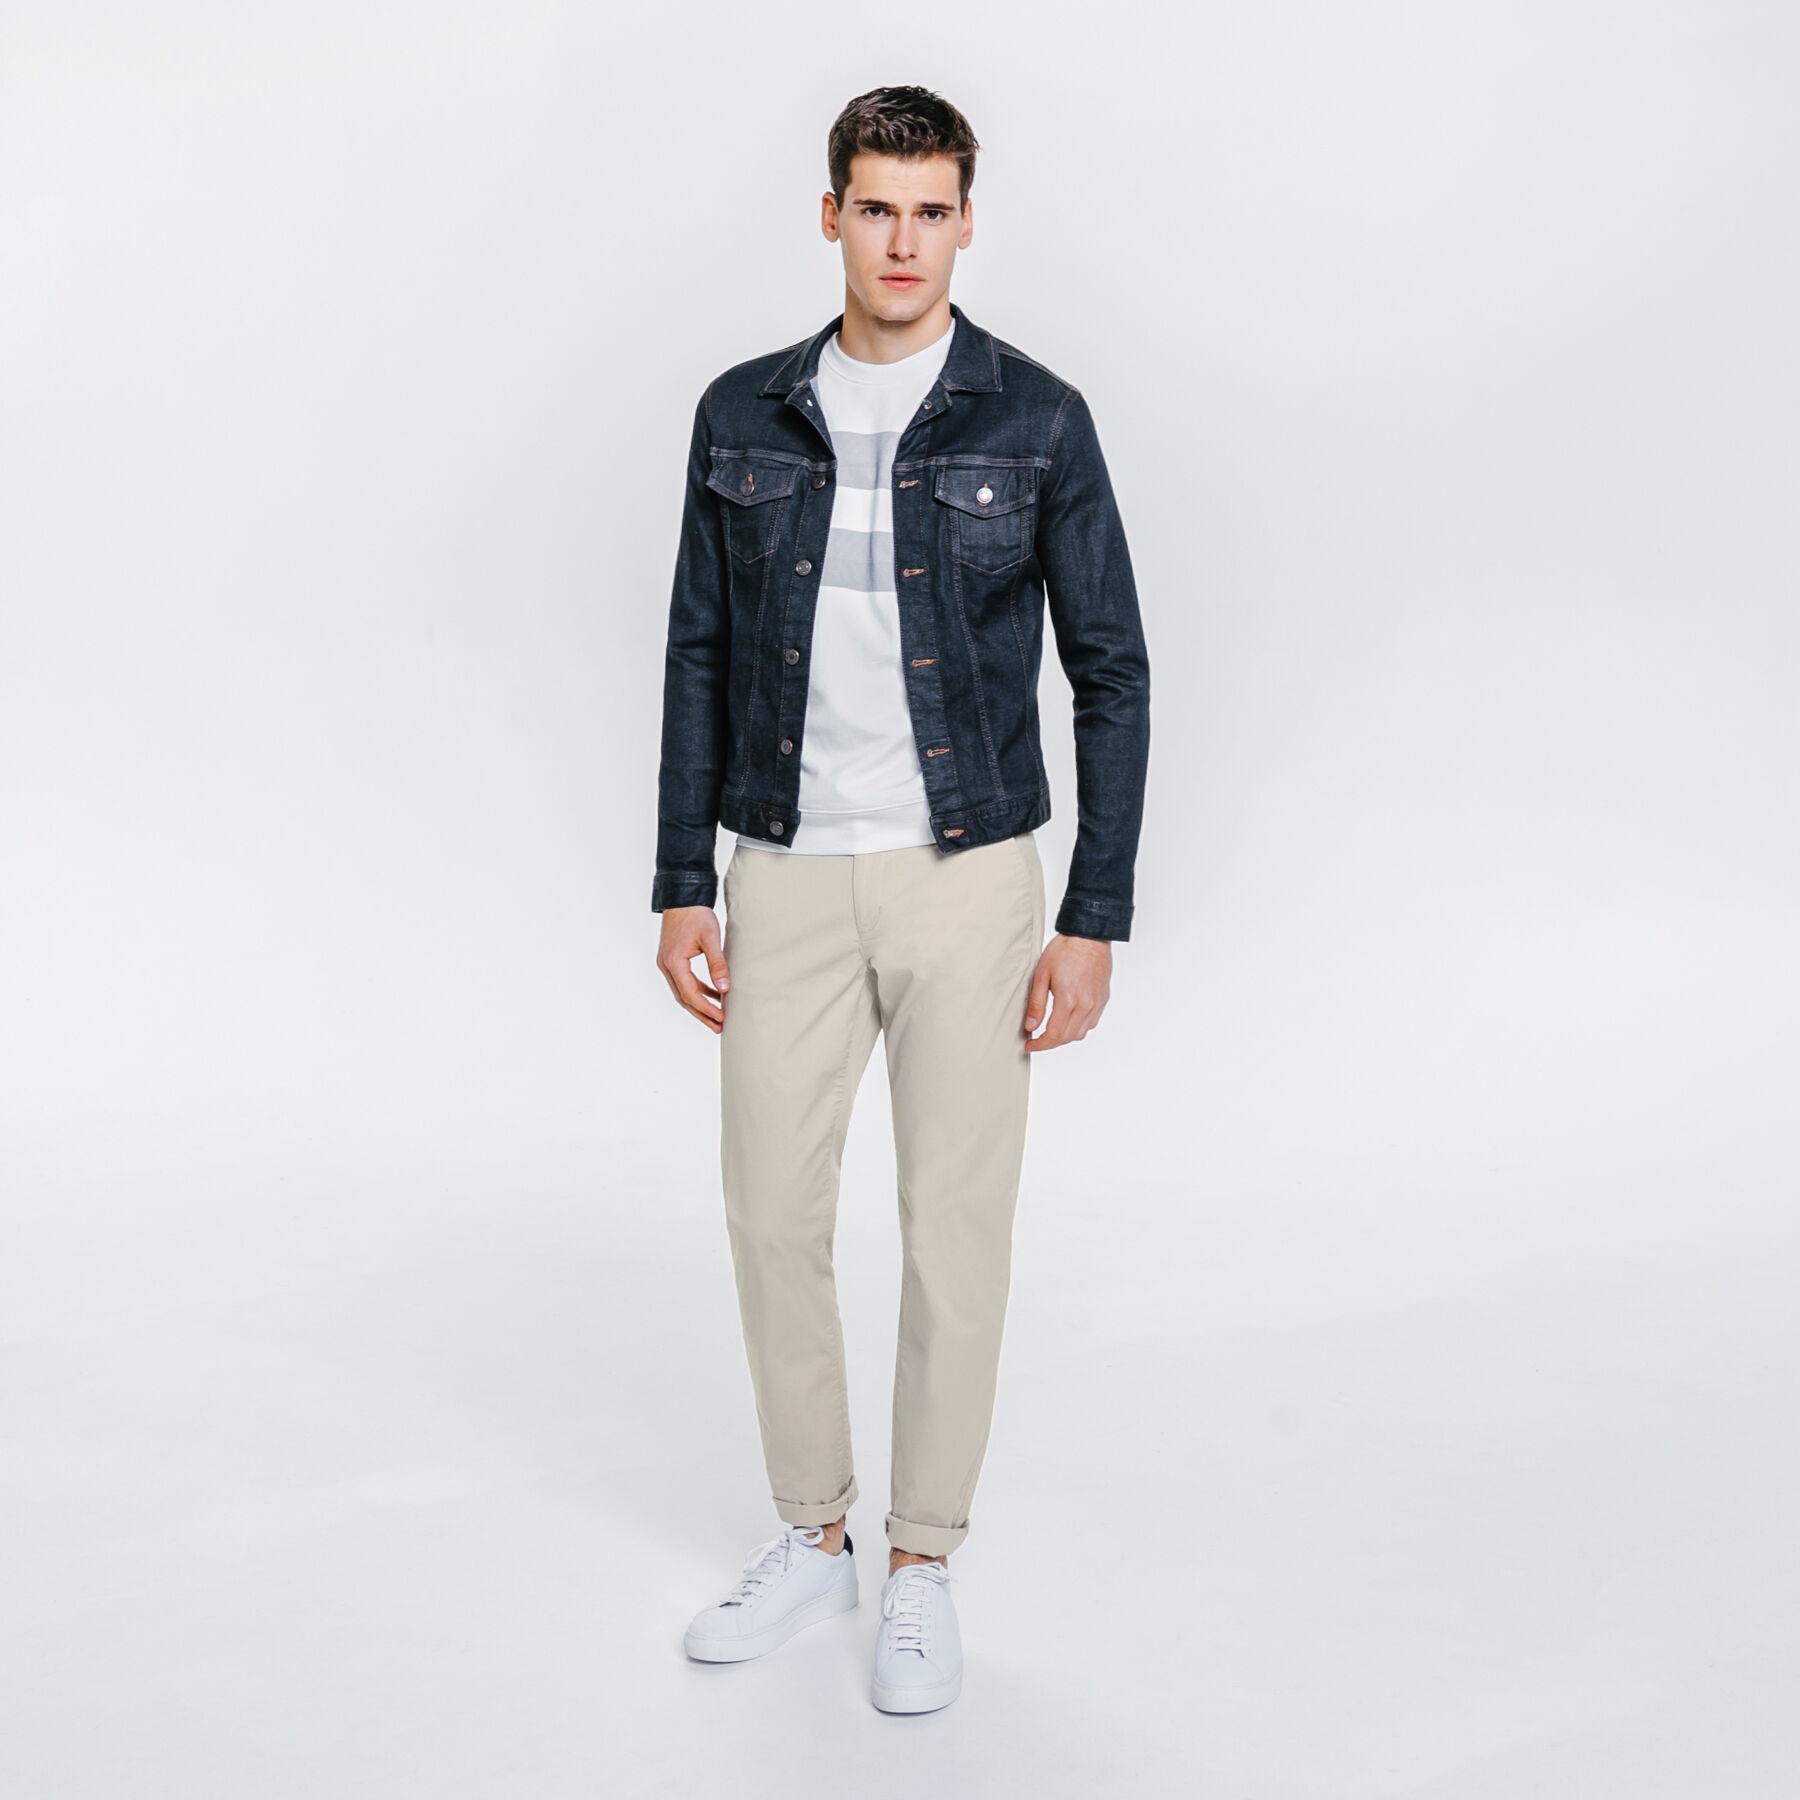 pantalon chino slim coton stretch mastic homme jules. Black Bedroom Furniture Sets. Home Design Ideas